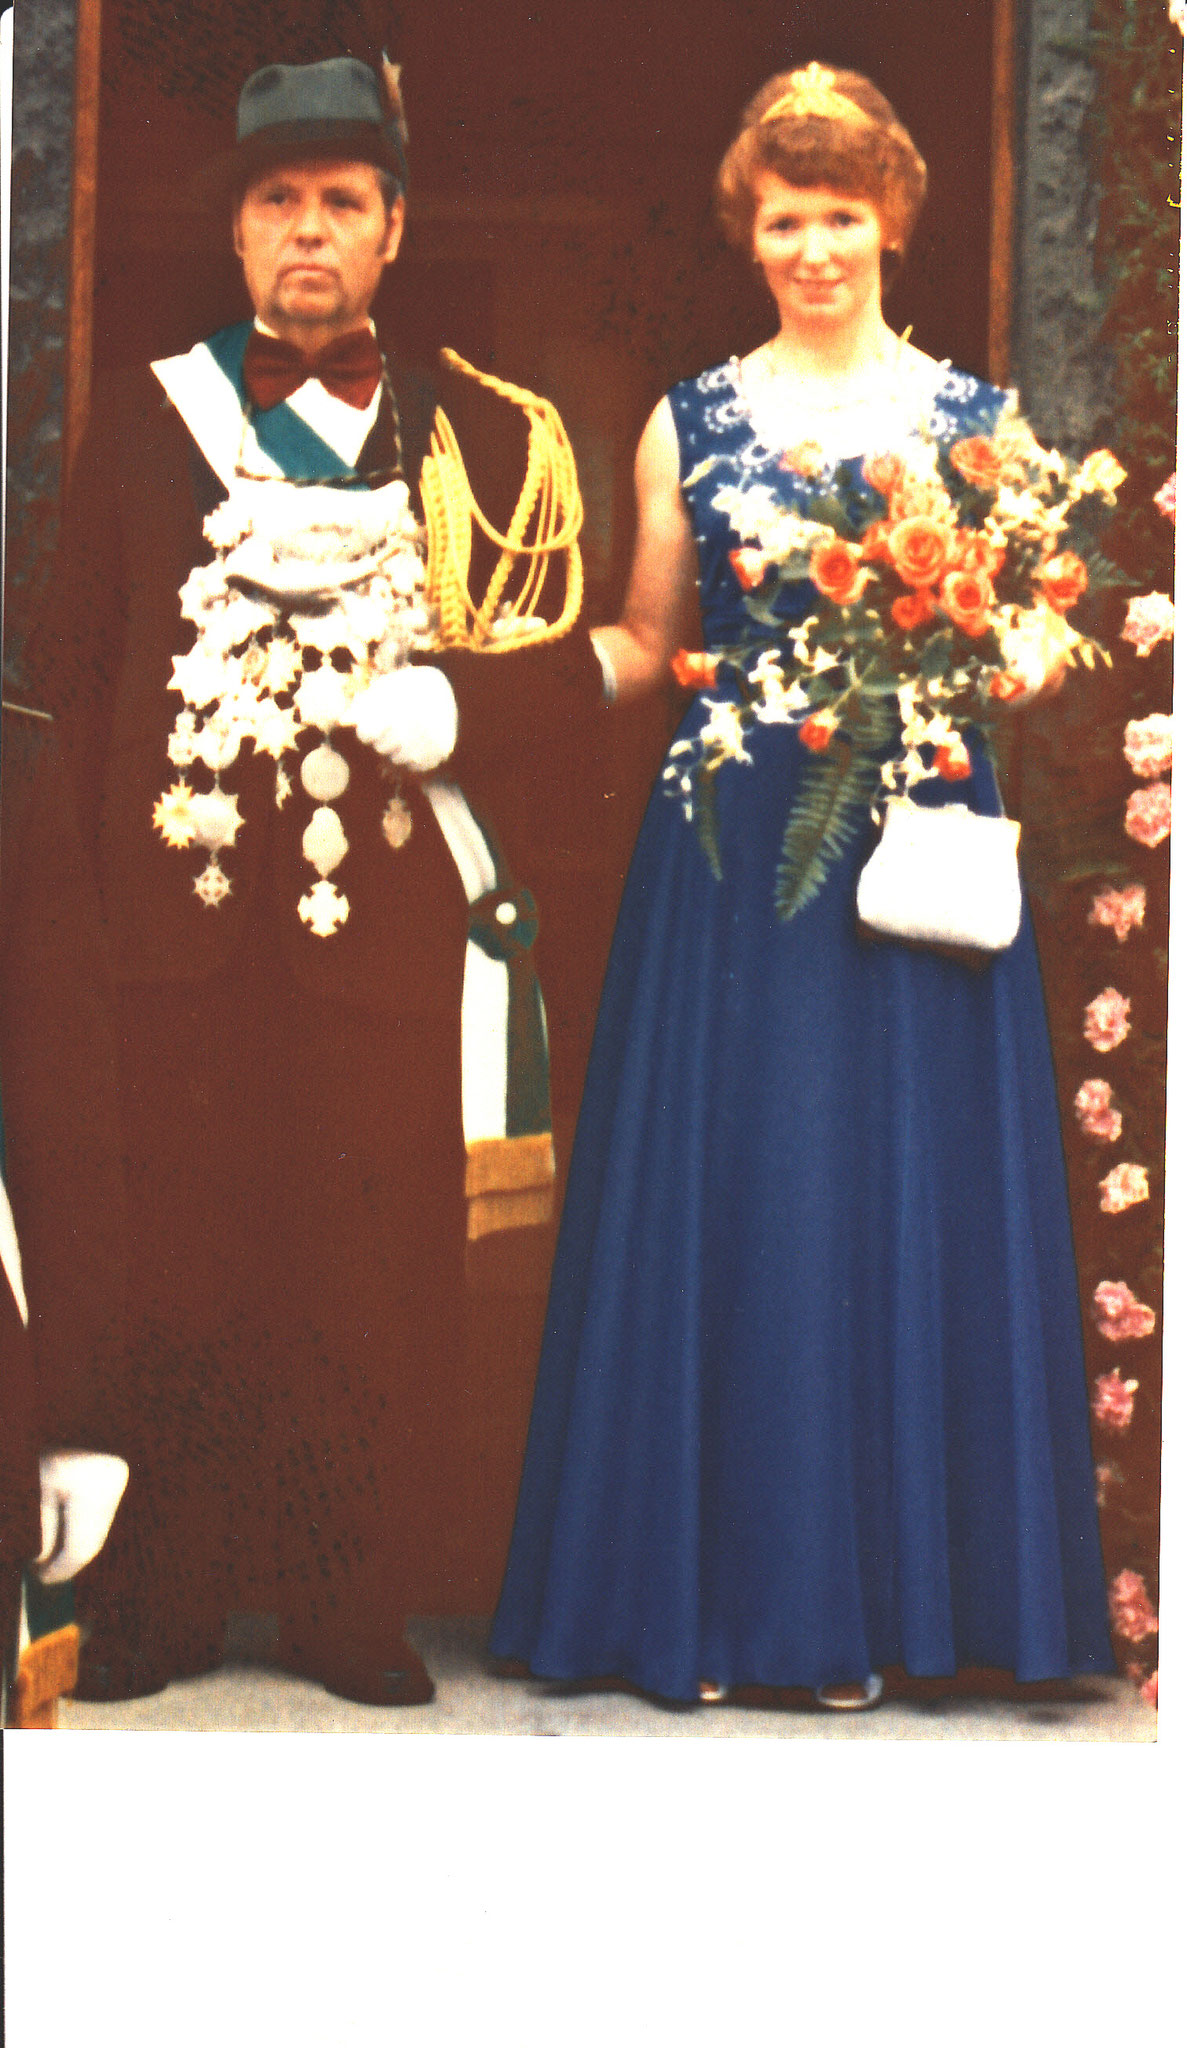 1975 Ferdi Bröggelhoff+ & Anneliese Lückenkötter